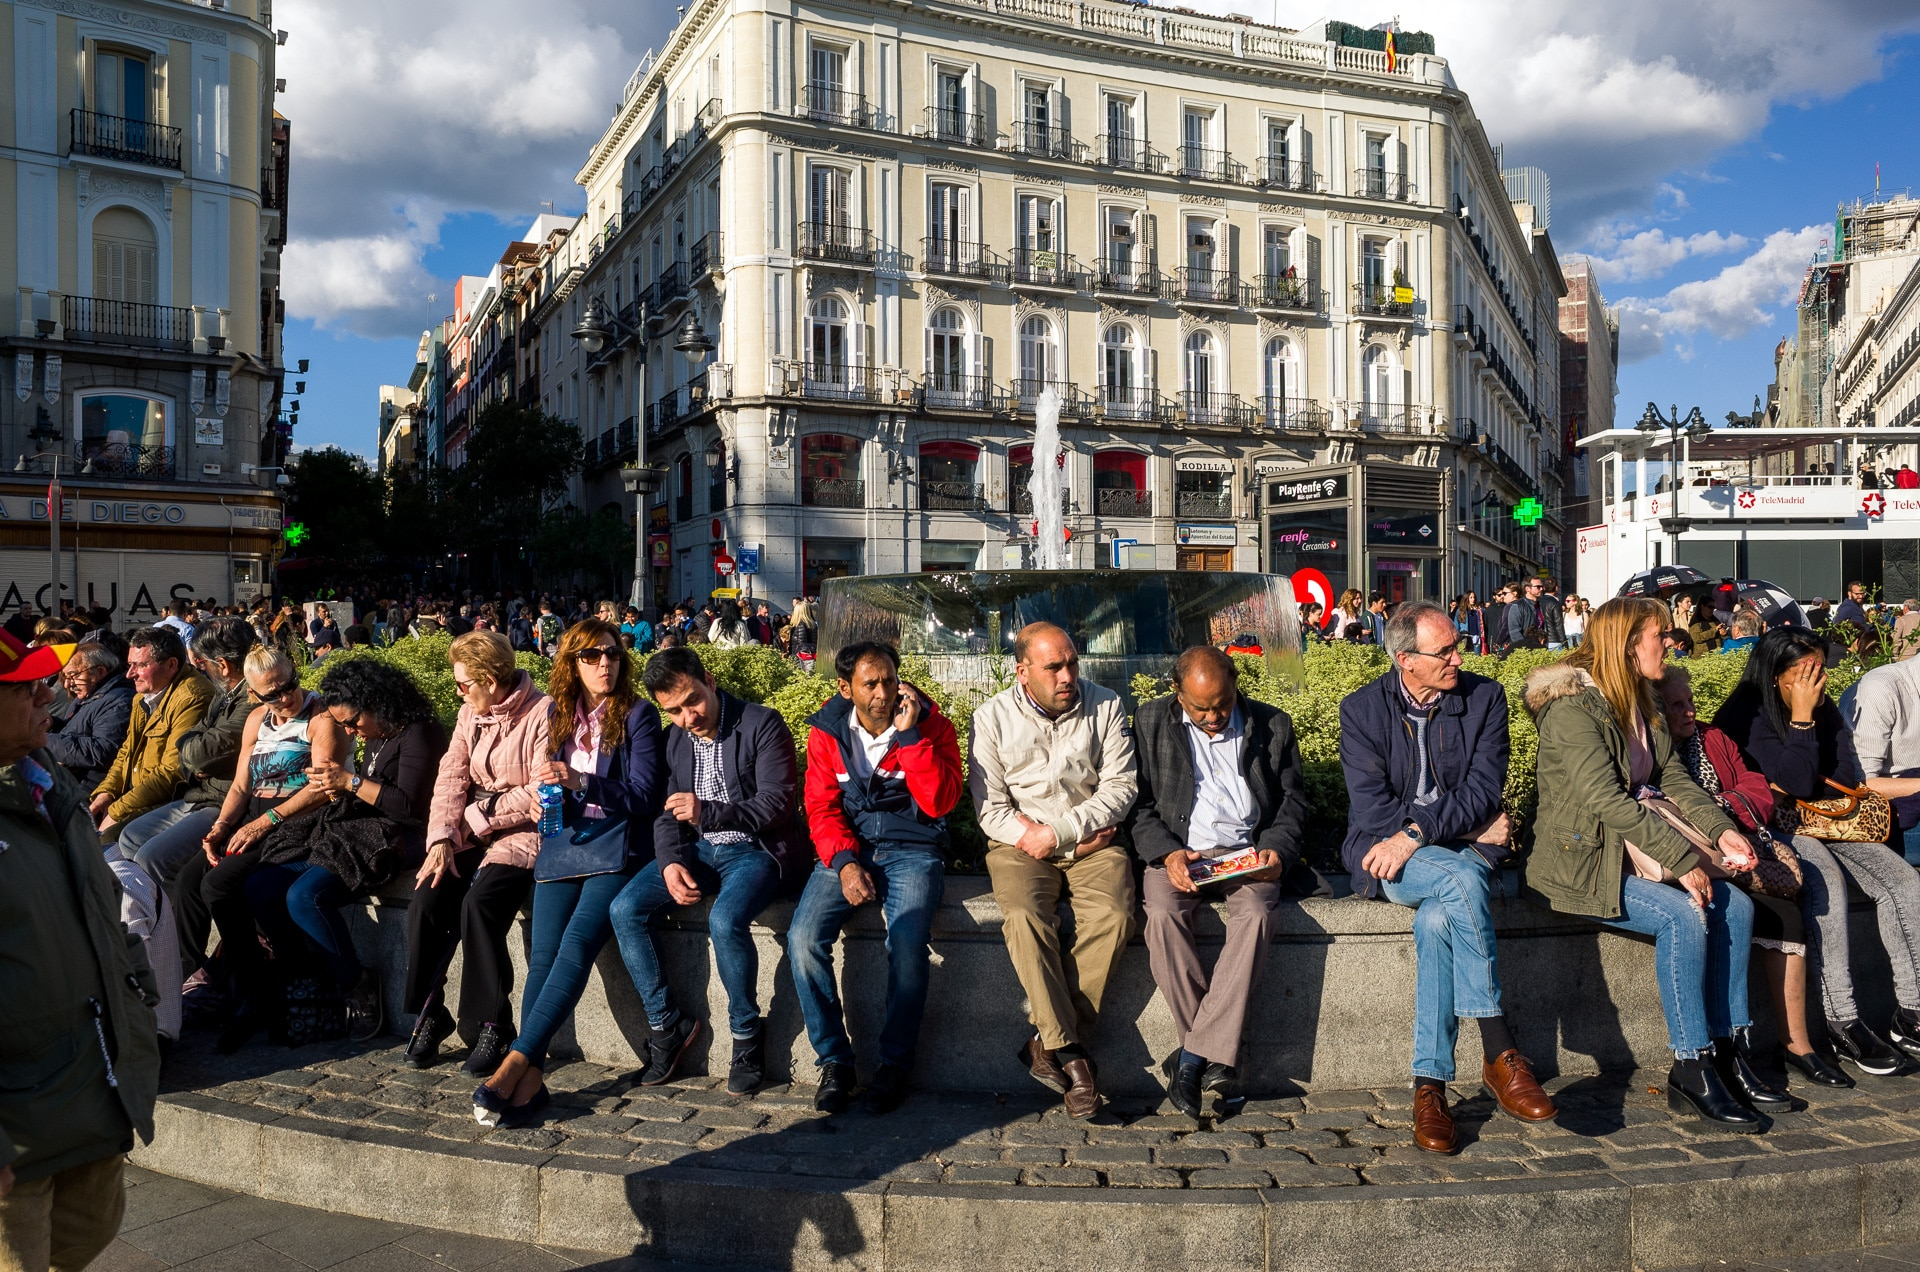 Los Madrileños: A Photo Story